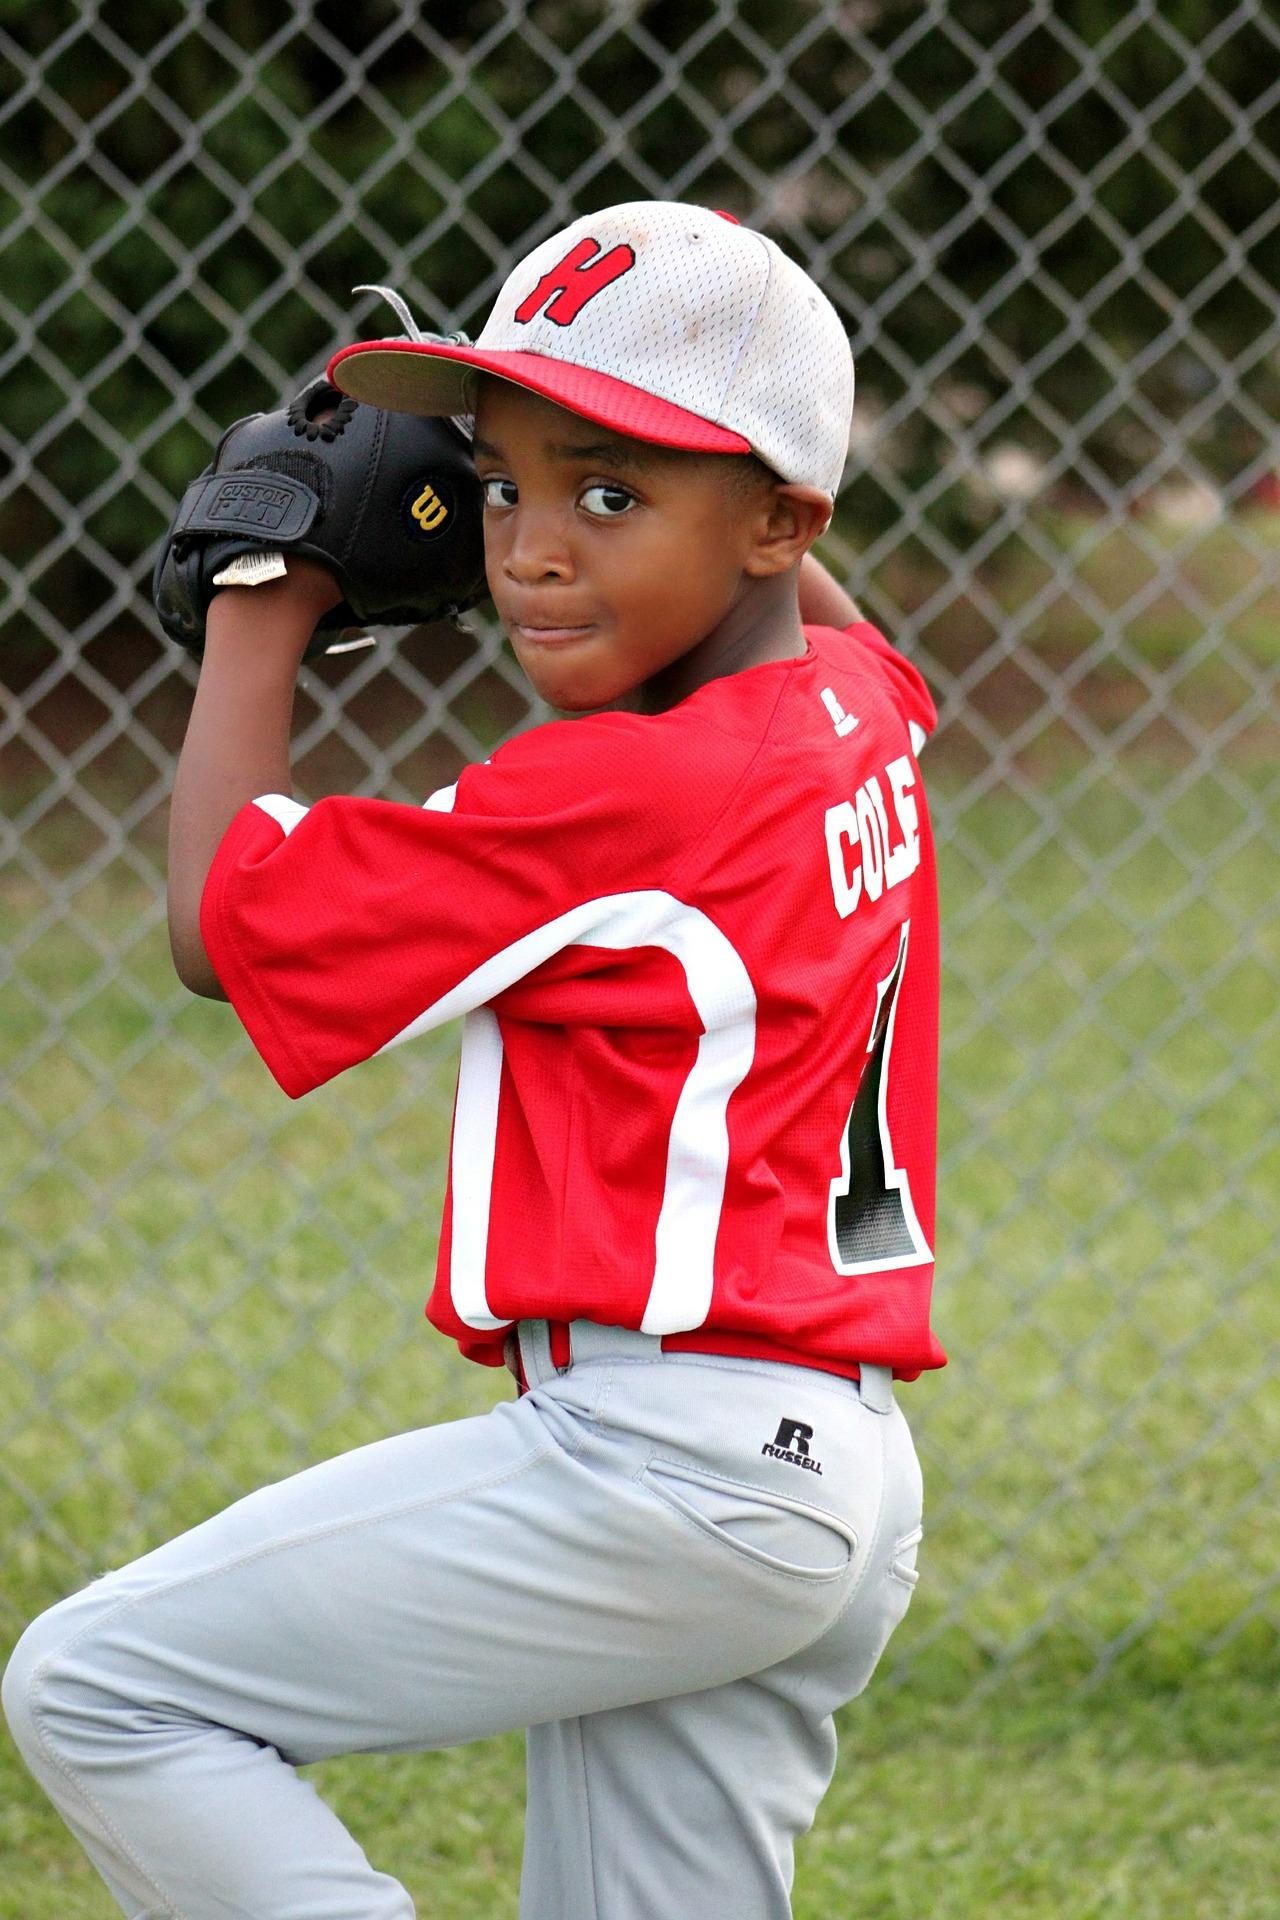 Baseball and the Rotator cuff